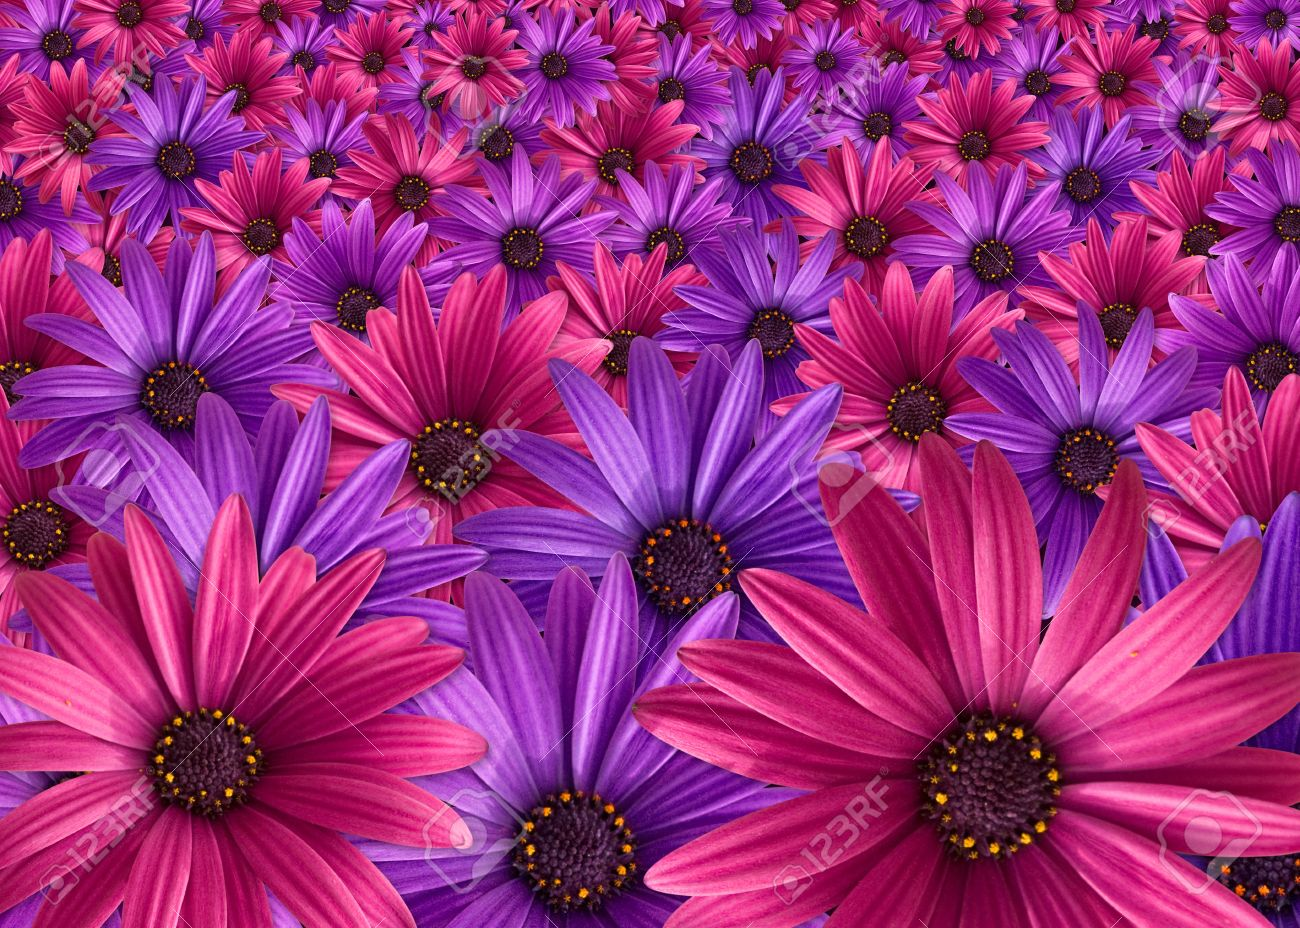 Pink and purple flowers background stock photo picture and royalty pink and purple flowers background mightylinksfo